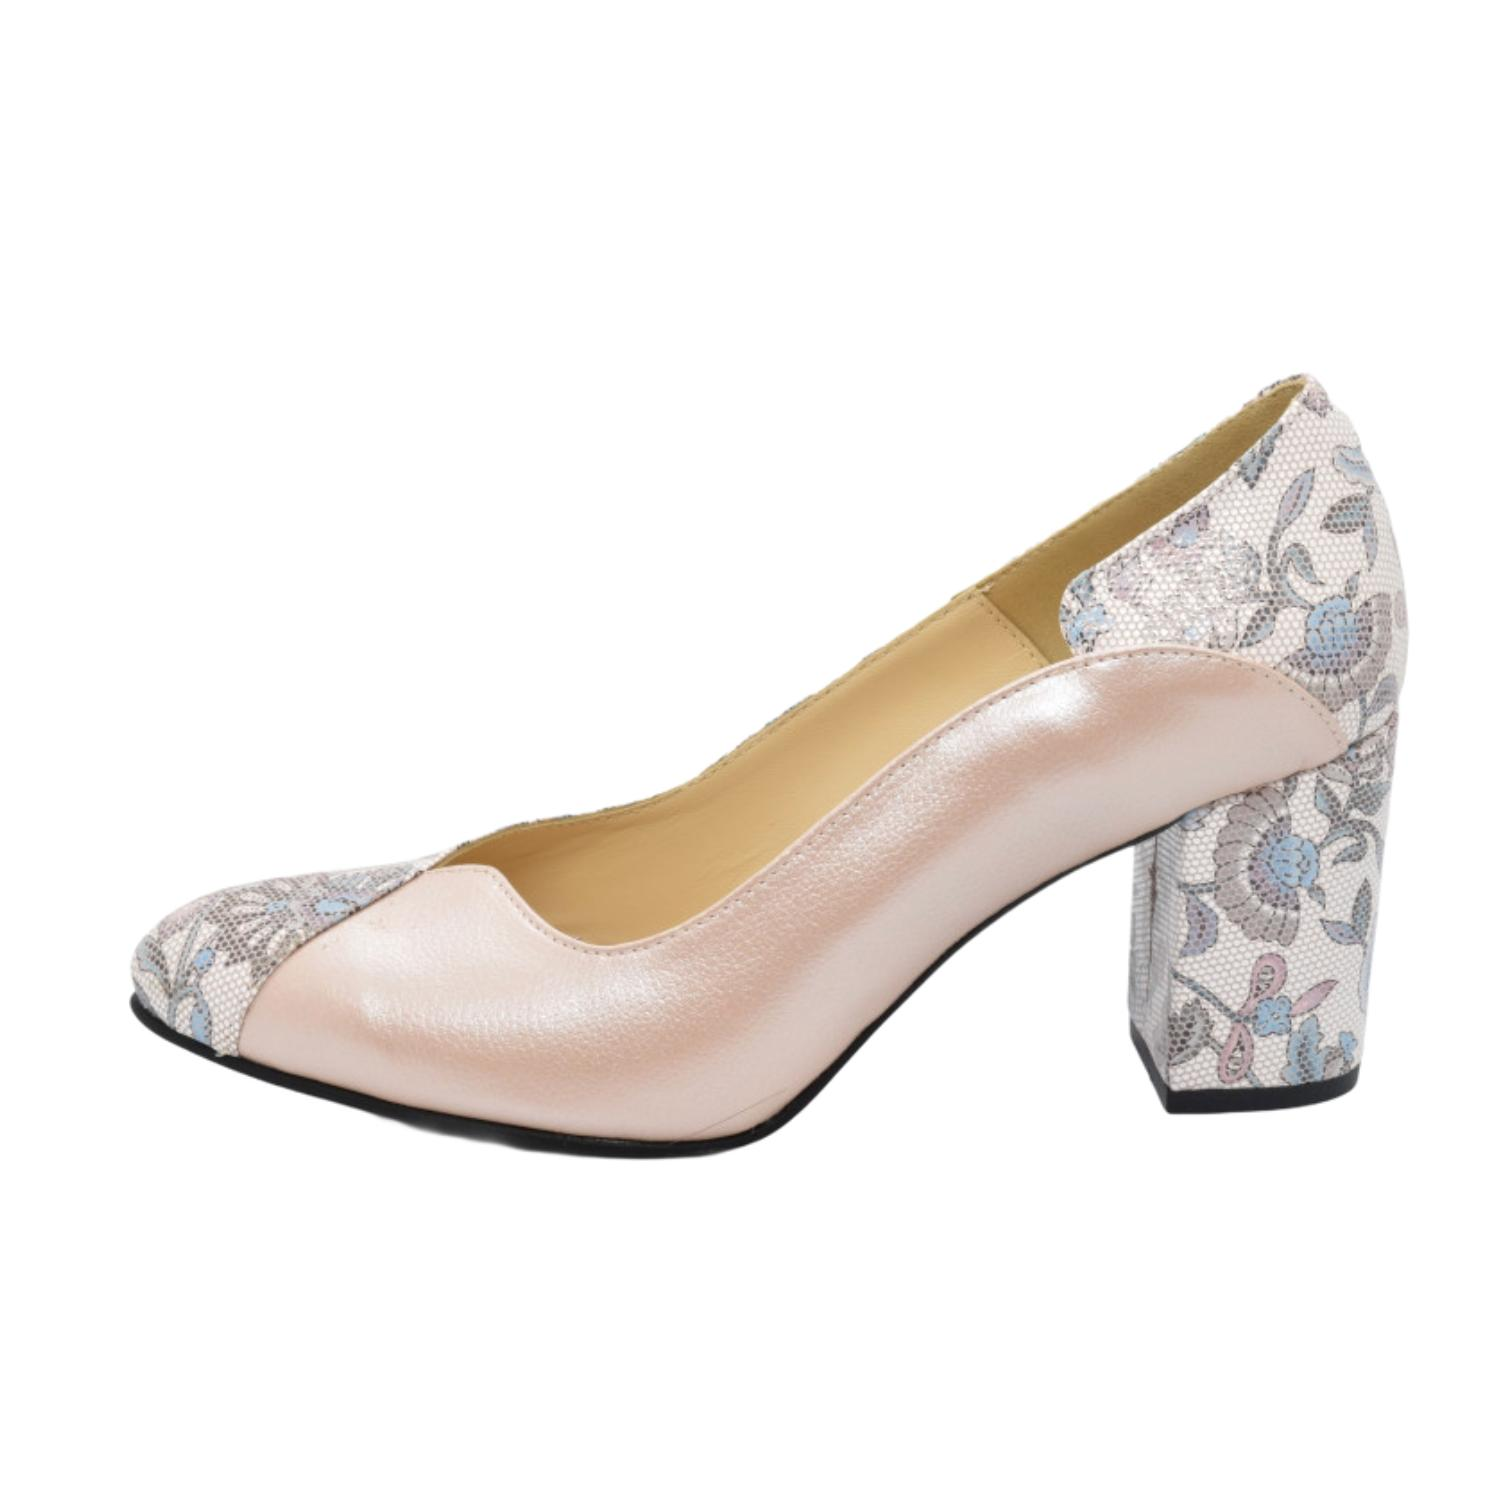 Pantofi pudra cu model floral